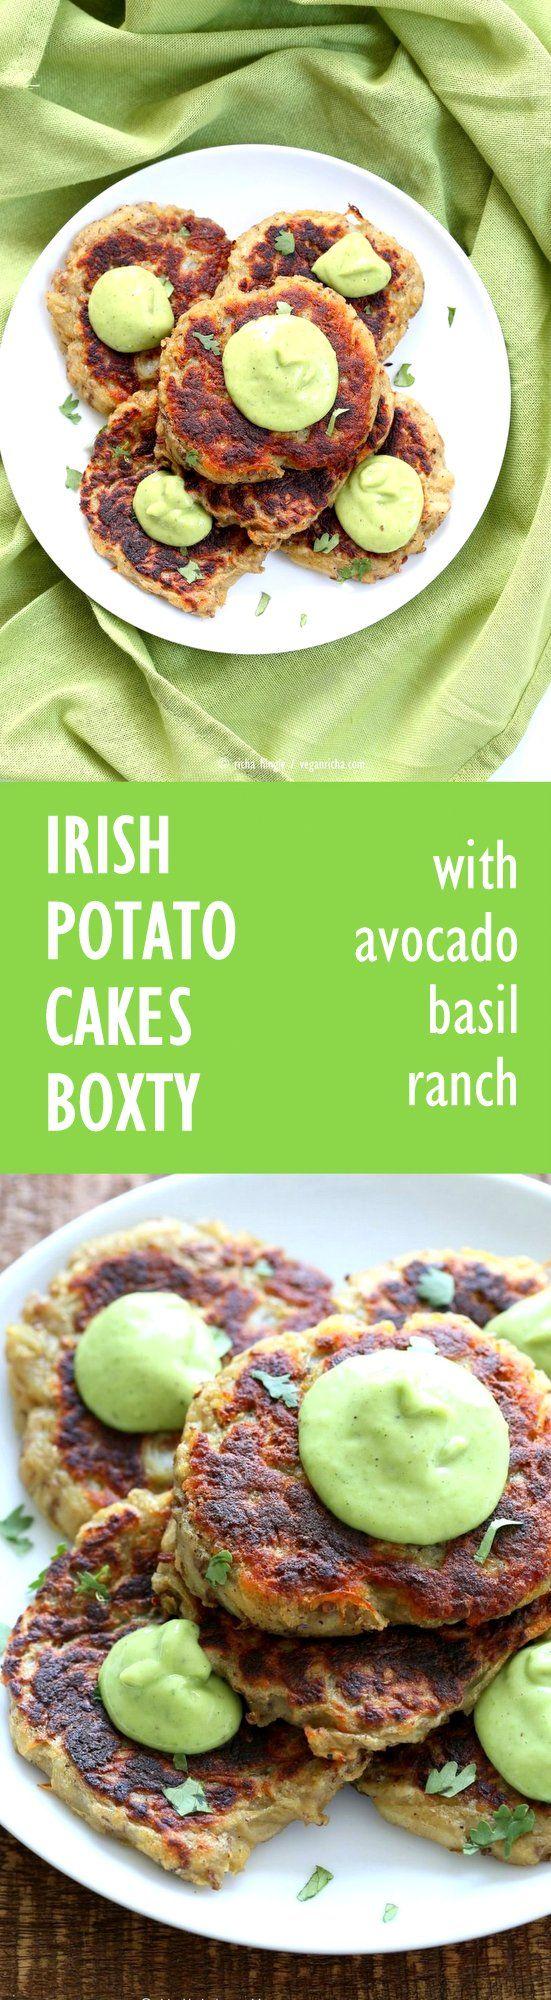 Traditional Irish potato cakes known as boxty, made eggless and vegan. Serve with avocado basil garlic ranch dressing. #Vegan #Soyfree #Recipe | VeganRicha.com